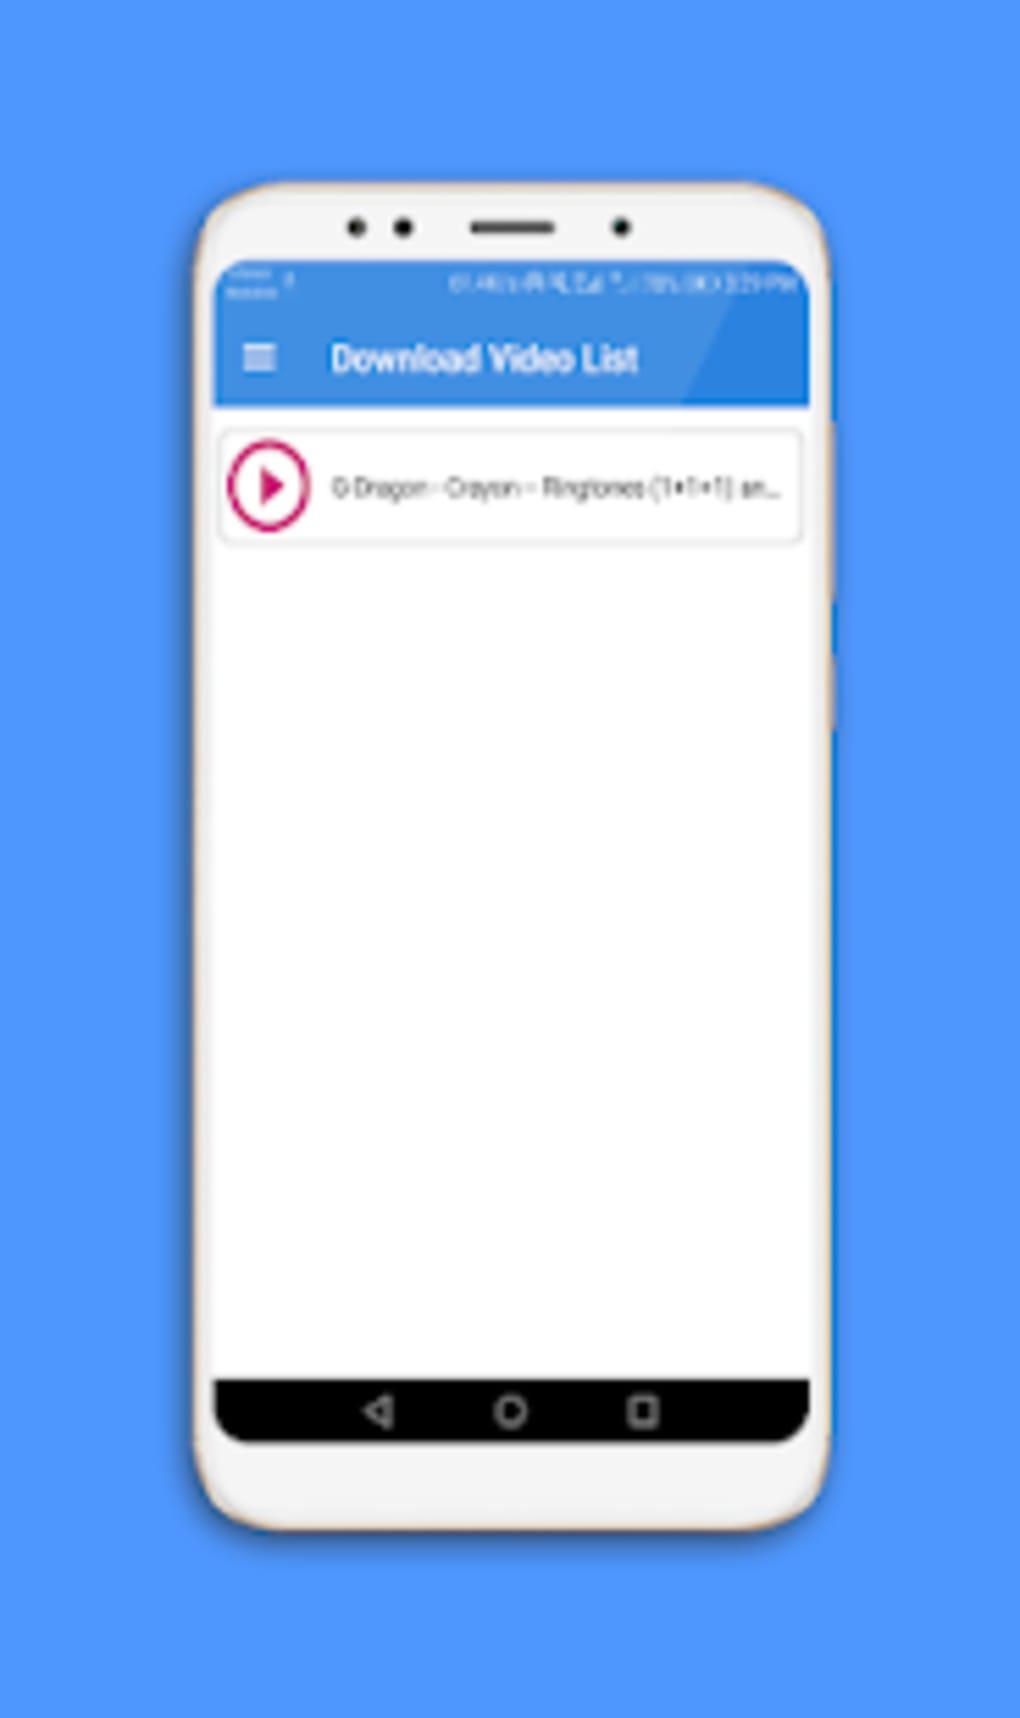 All HD Video Downloader - 4k Video Downloader for Android